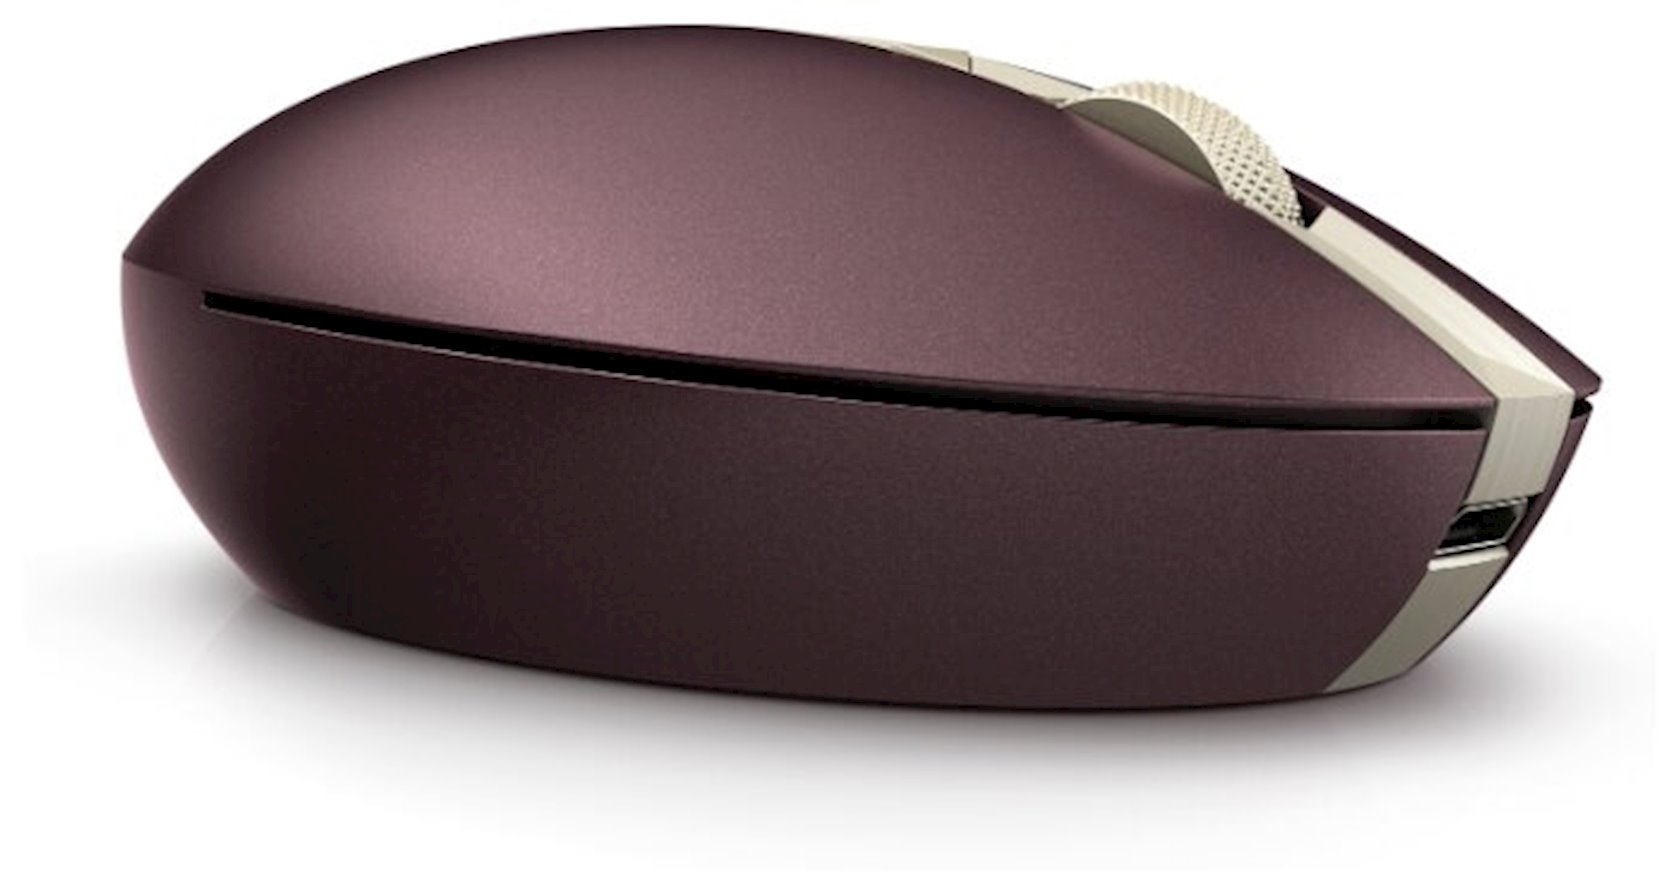 Simsiz siçan HP Spectre Mouse 700 Burgundy 5vd59aa Bluetooth